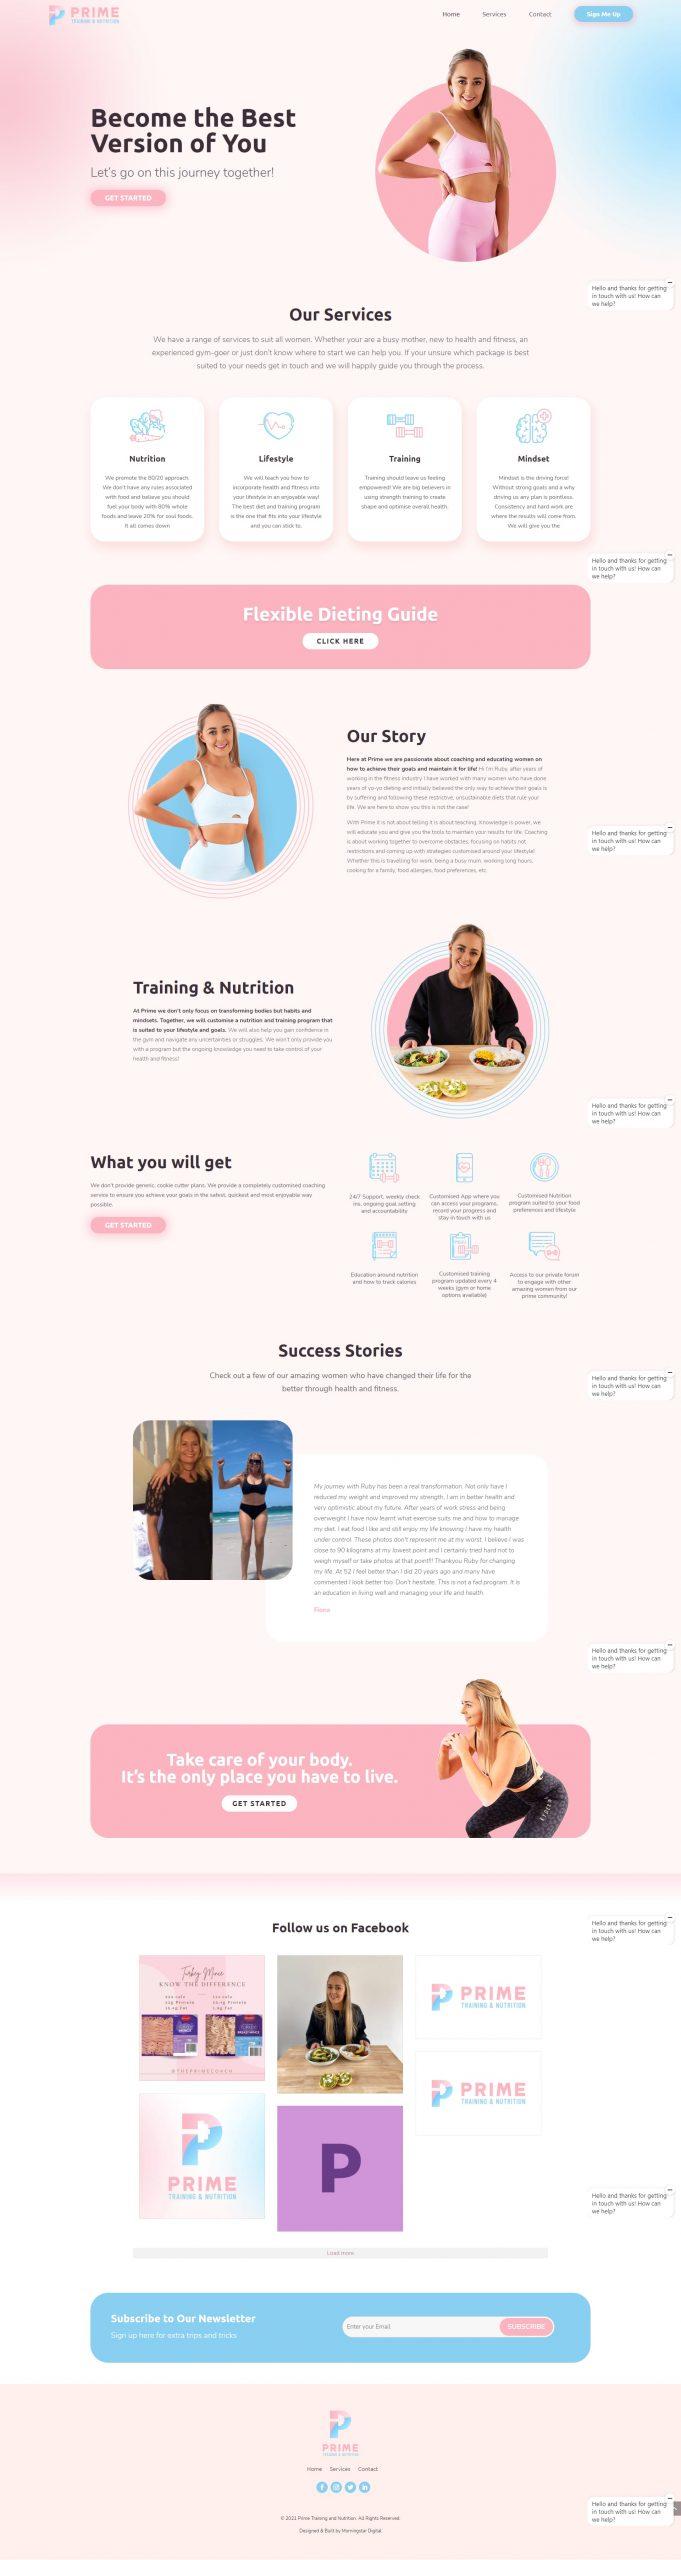 Prime Homepage